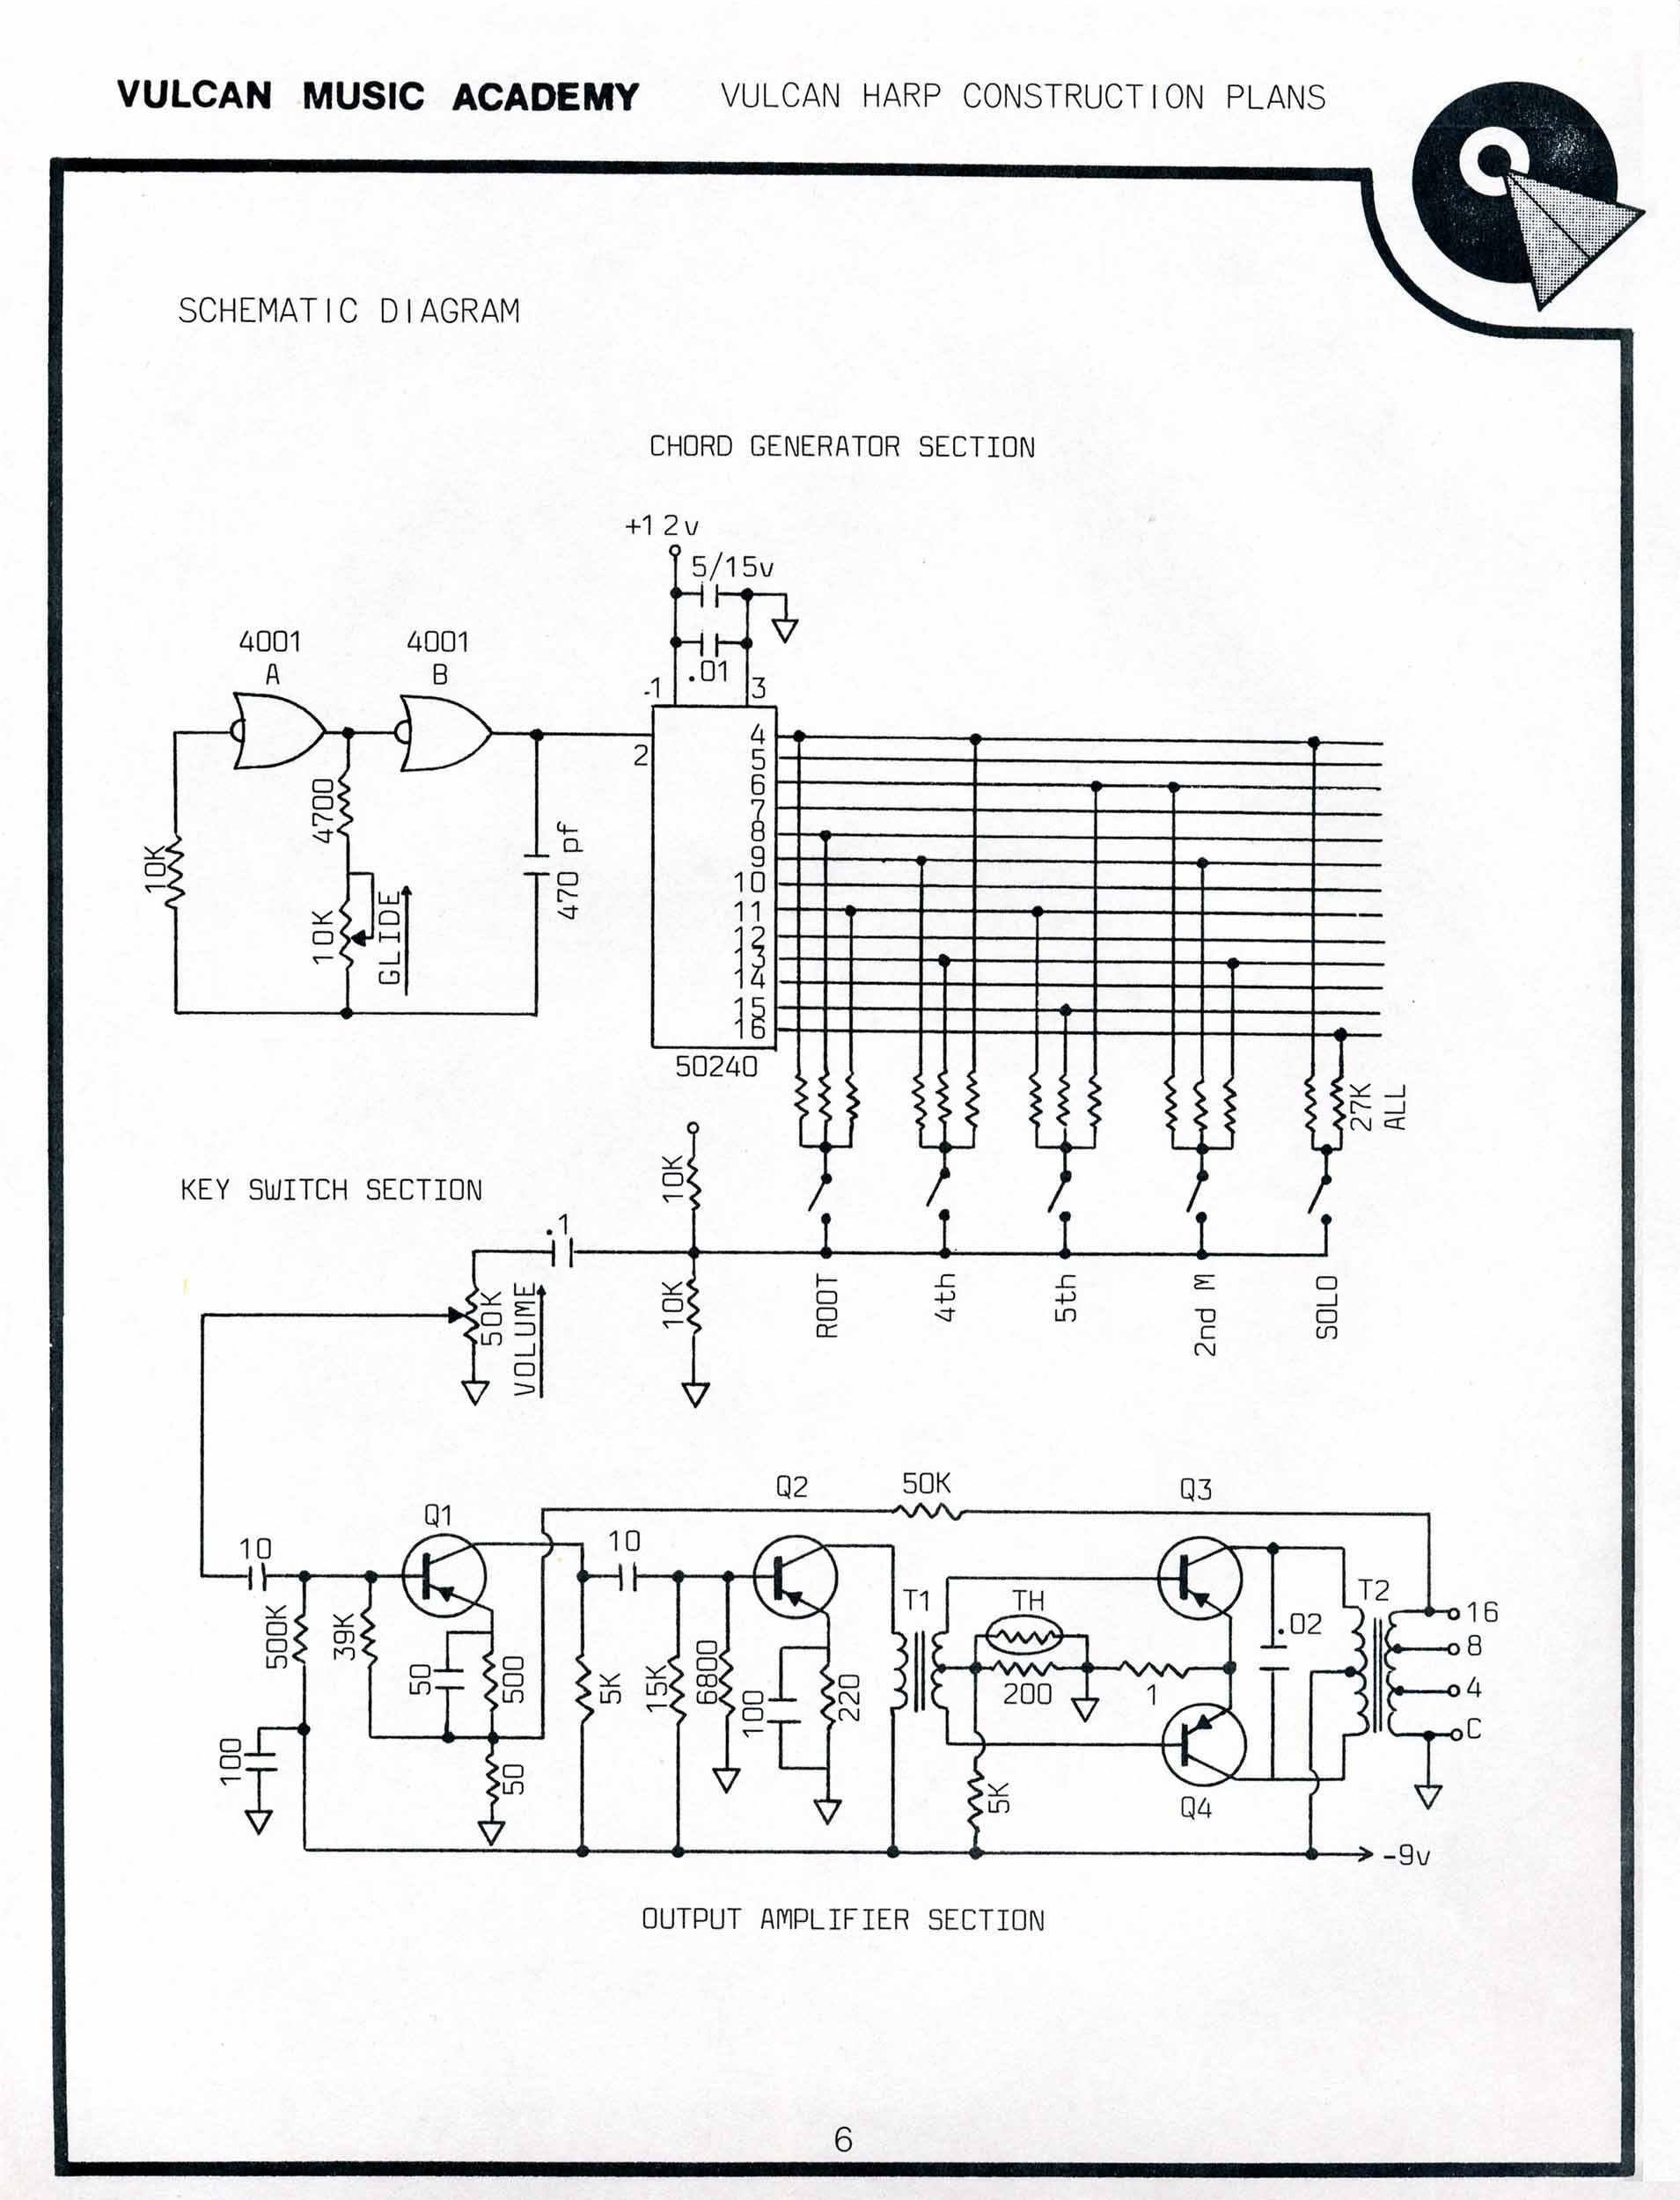 vulcan harp construction plans sheet 6 star trek blueprints vulcan harp construction plans Light Dimmer Switch at bakdesigns.co